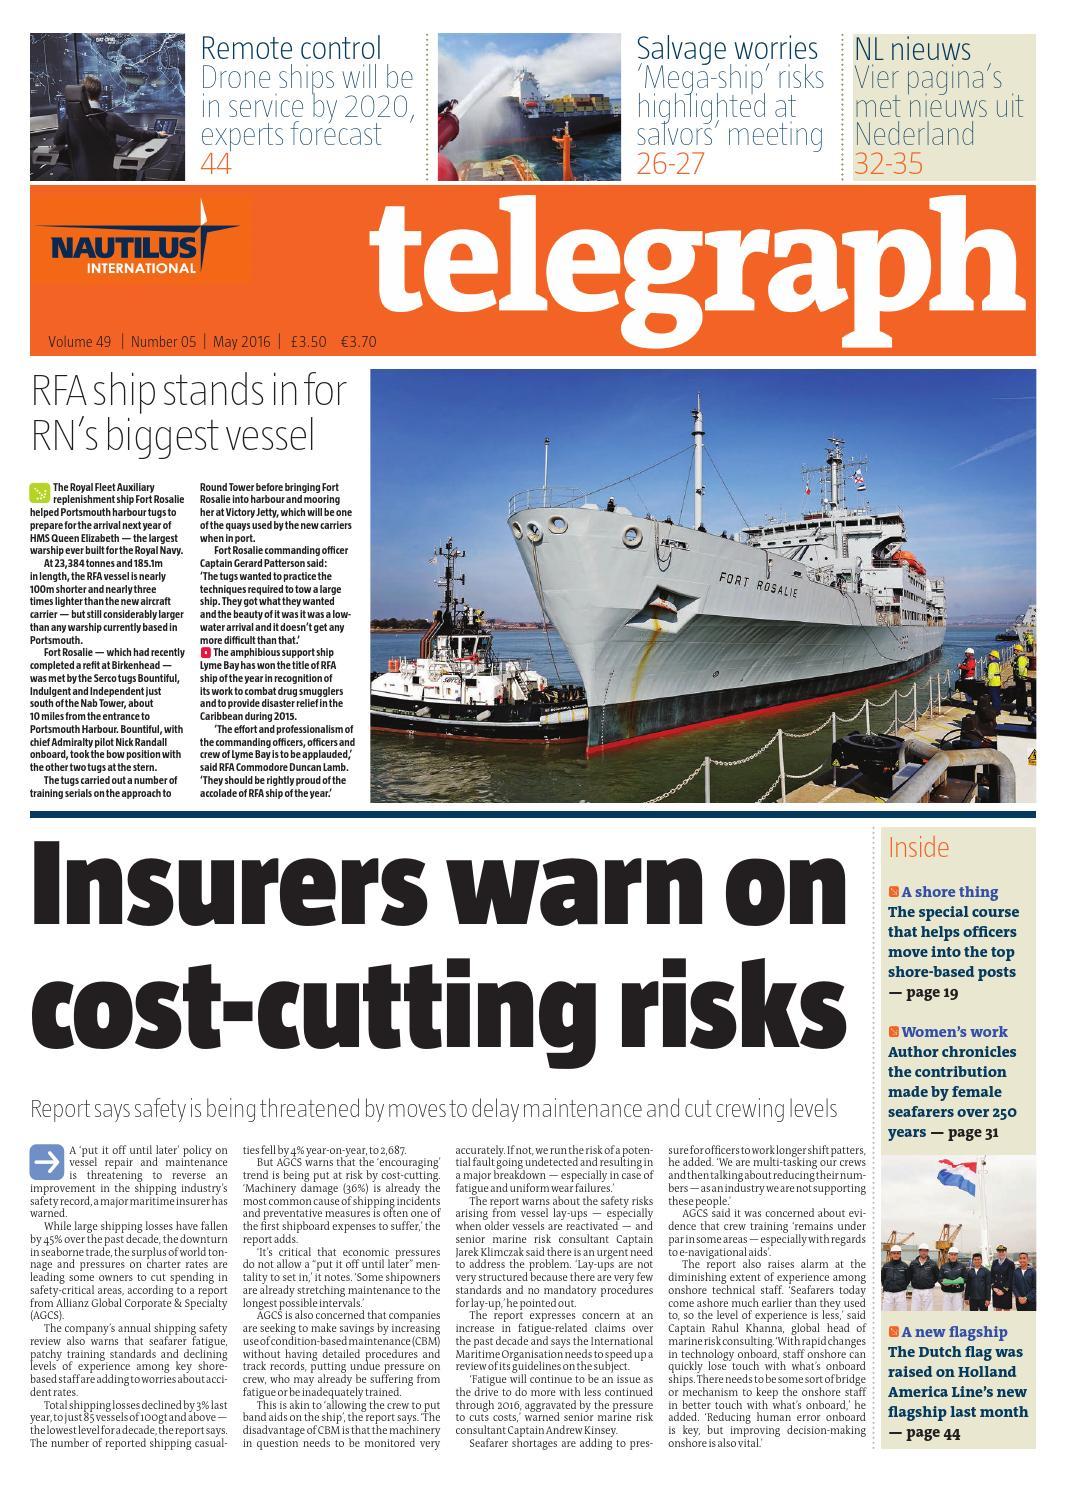 Nautilus Telegraph May 2016 by Redactive Media Group - issuu